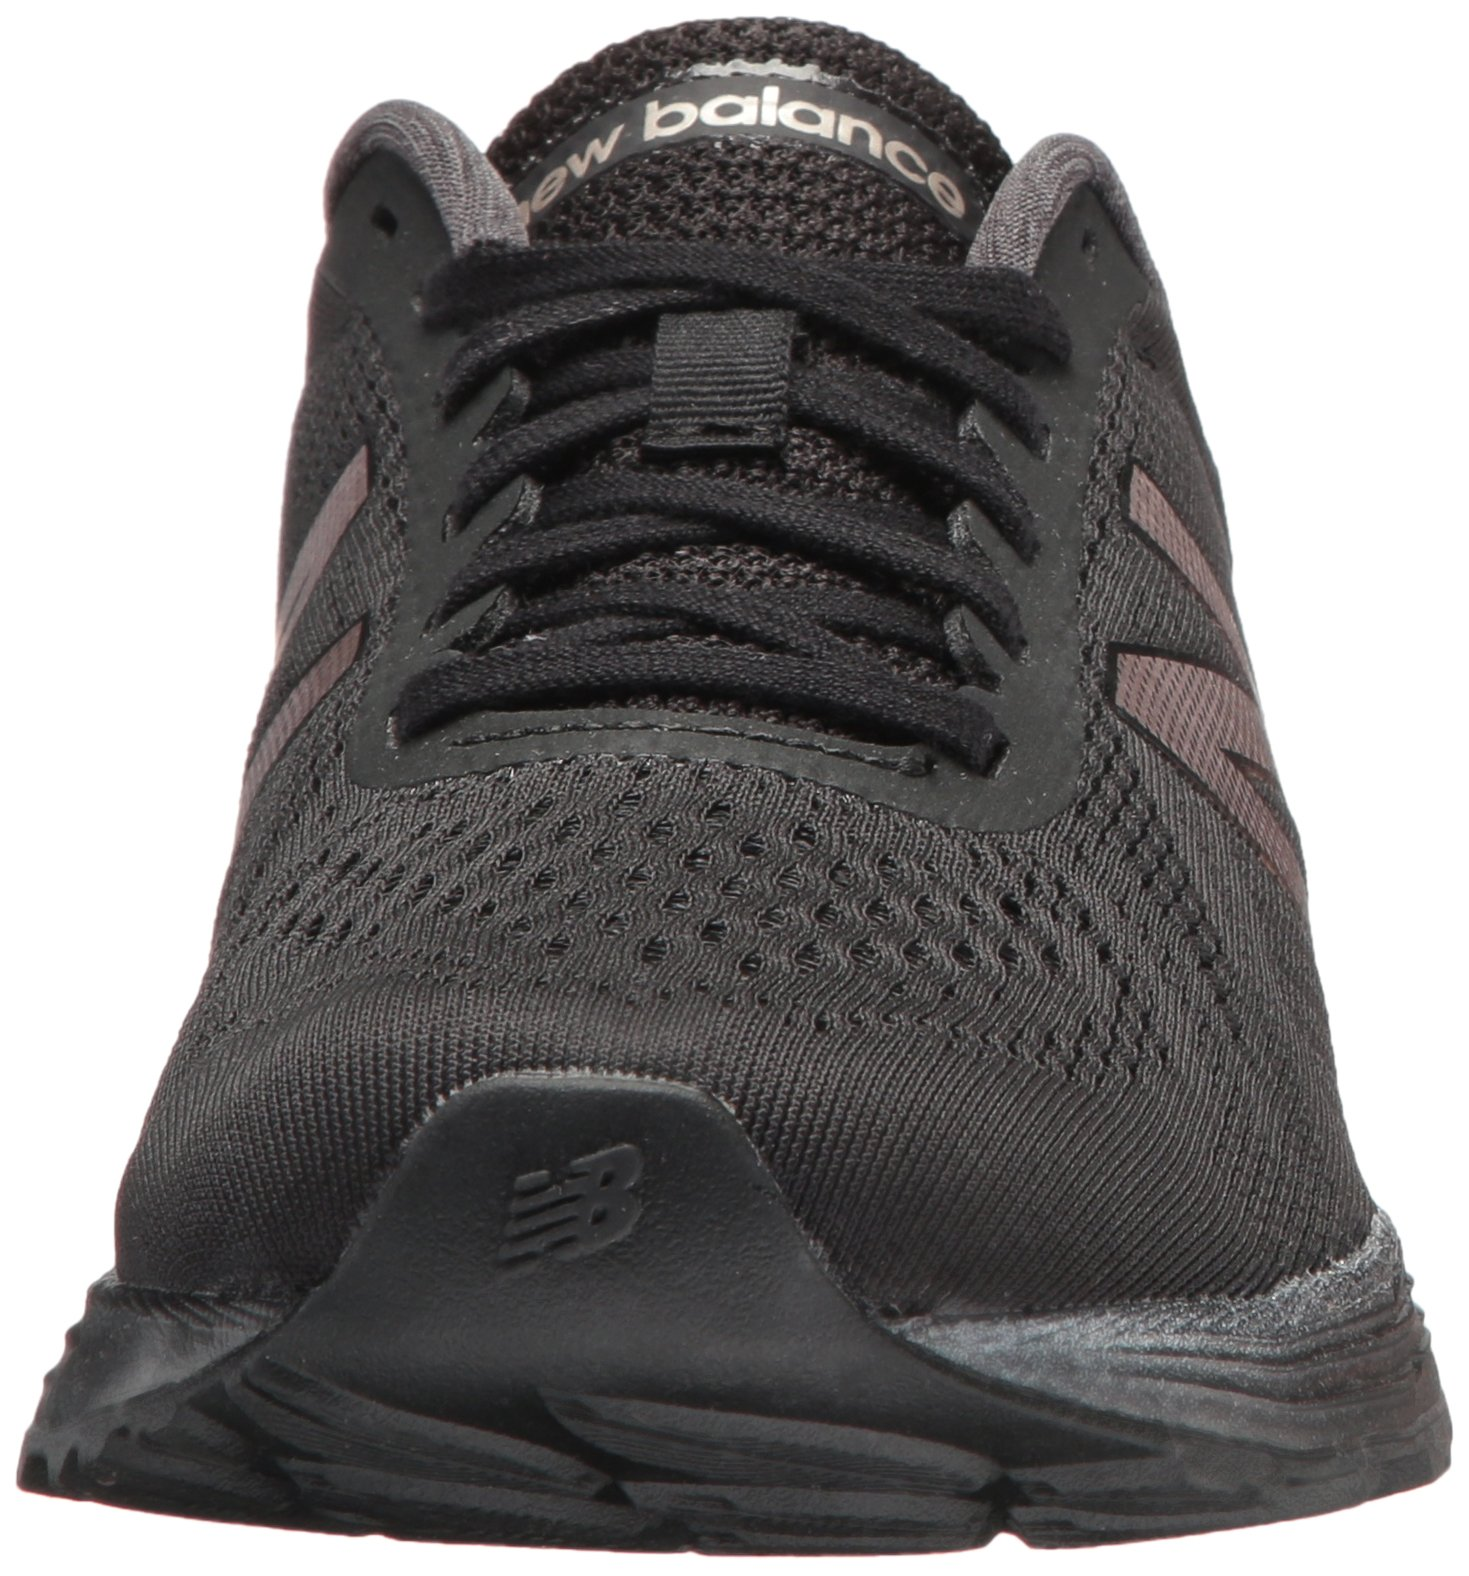 New Balance Women's Arishi v1 Fresh Foam Running Shoe, Black, 5 B US by New Balance (Image #4)